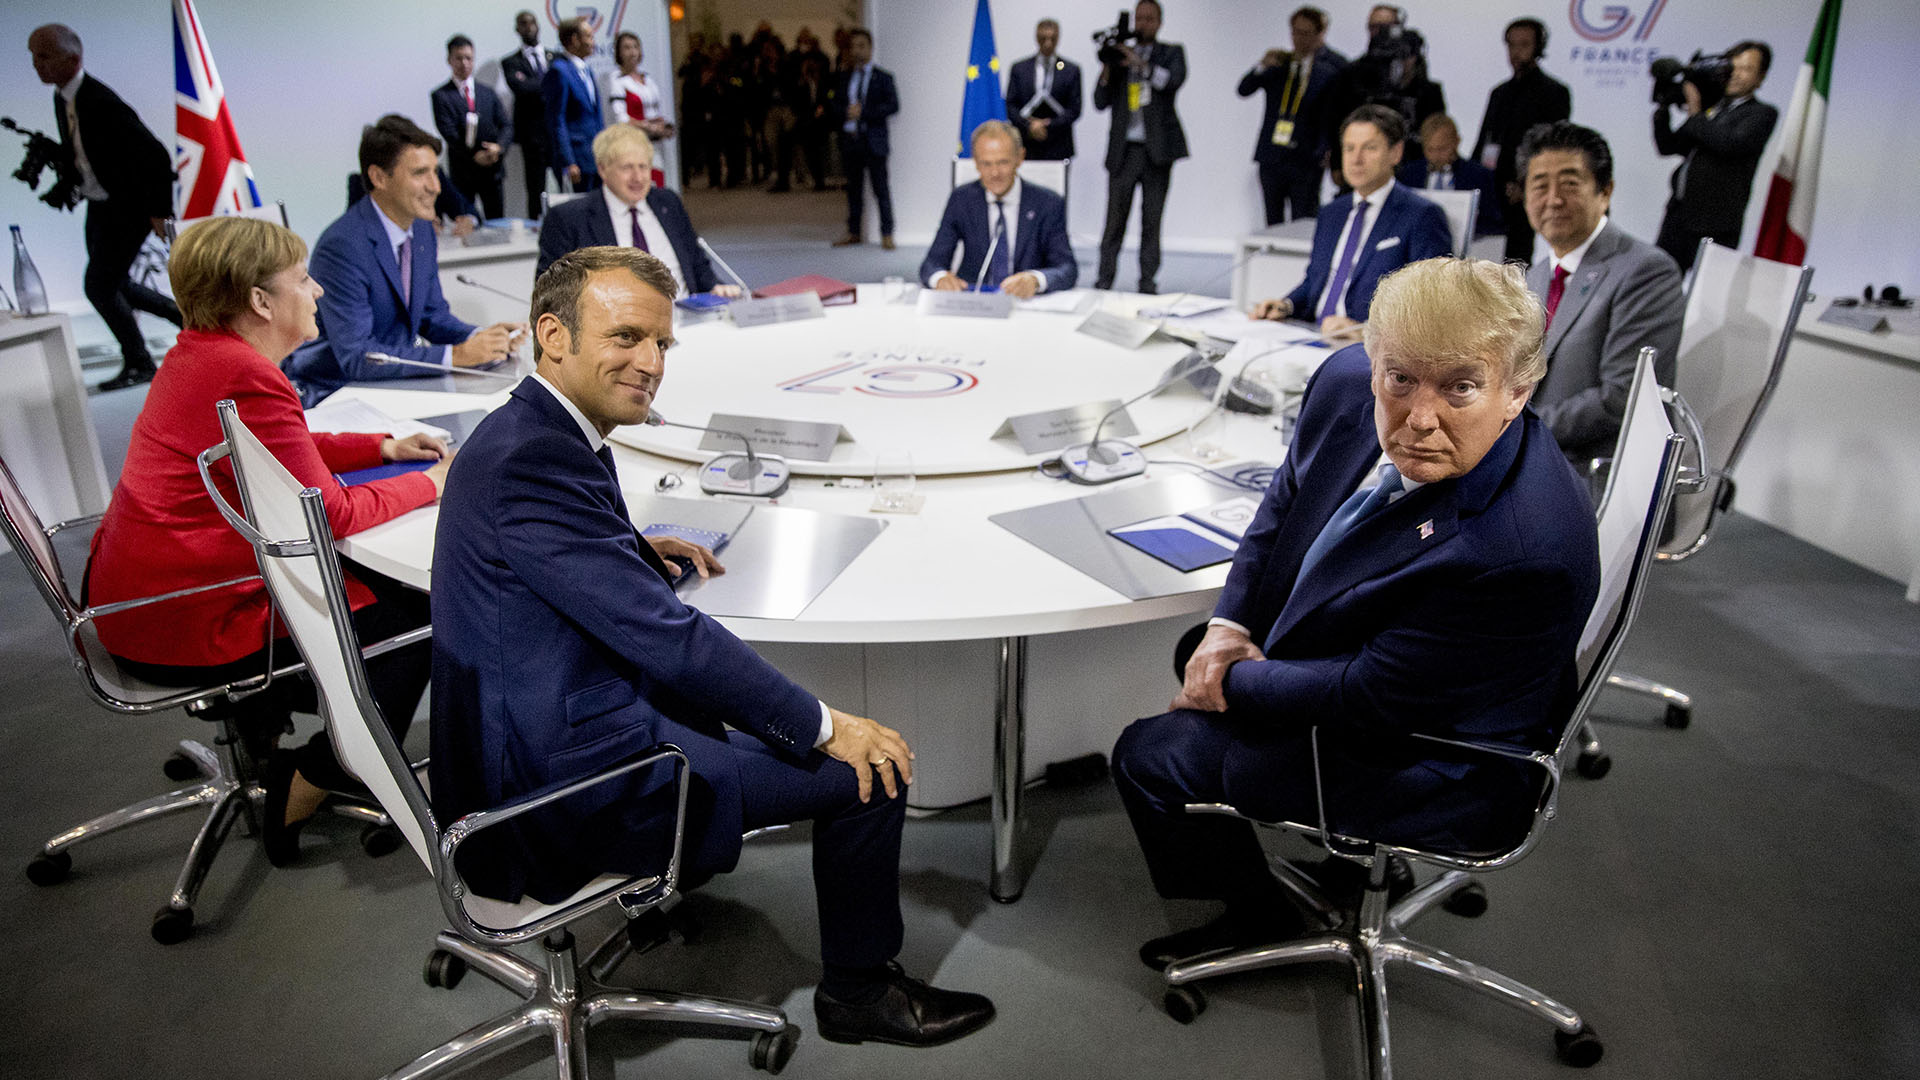 Donald Trump gesticula frente a los fotógrafos